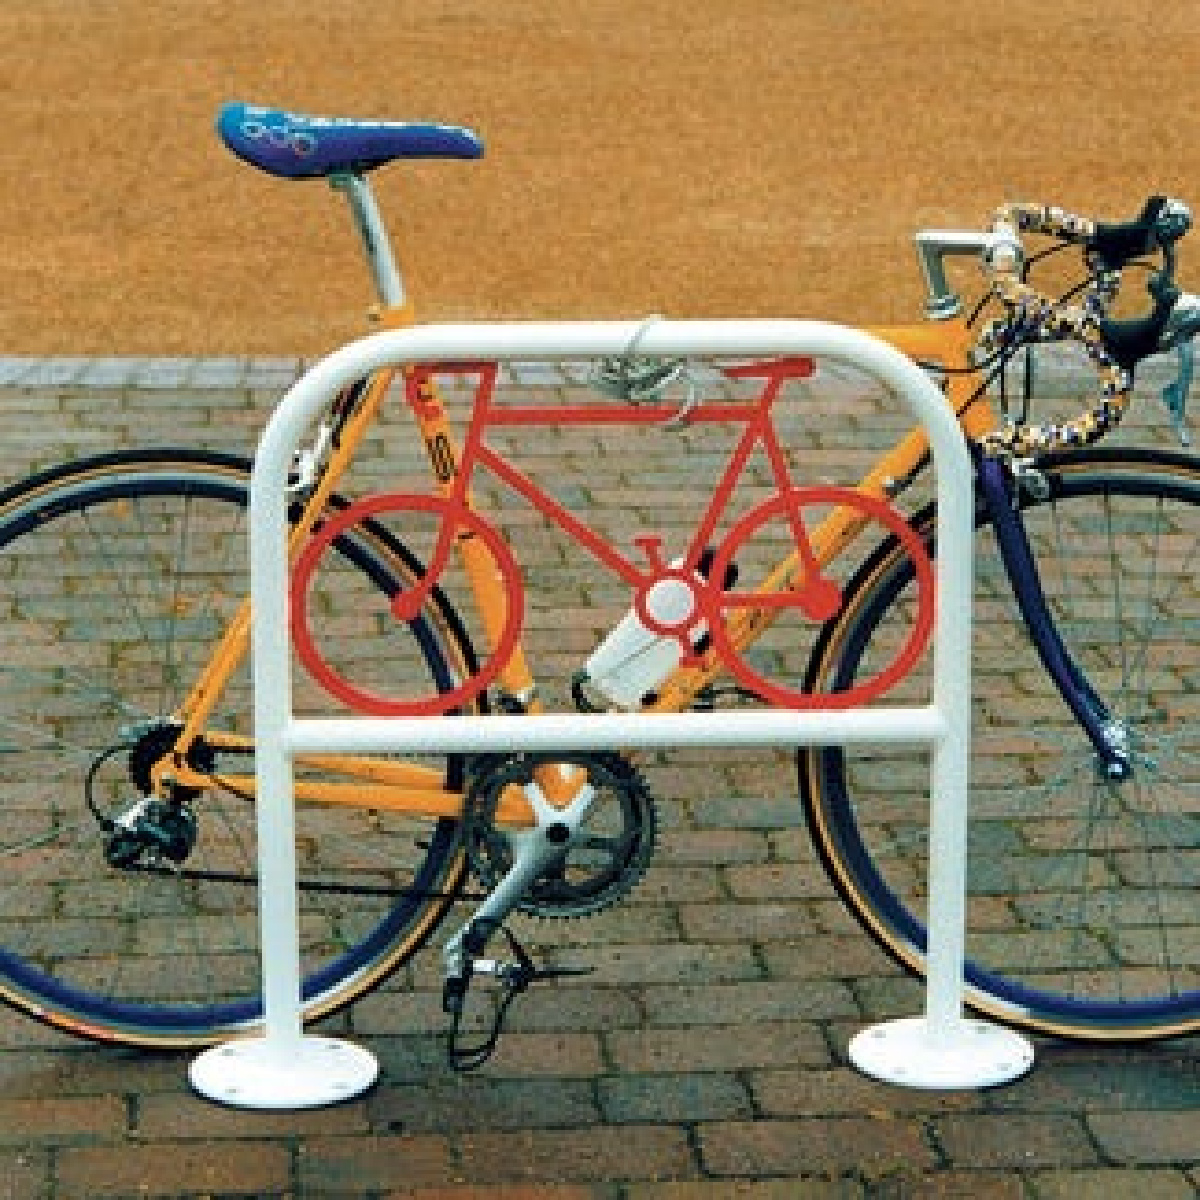 Merthyr Cycle Stand